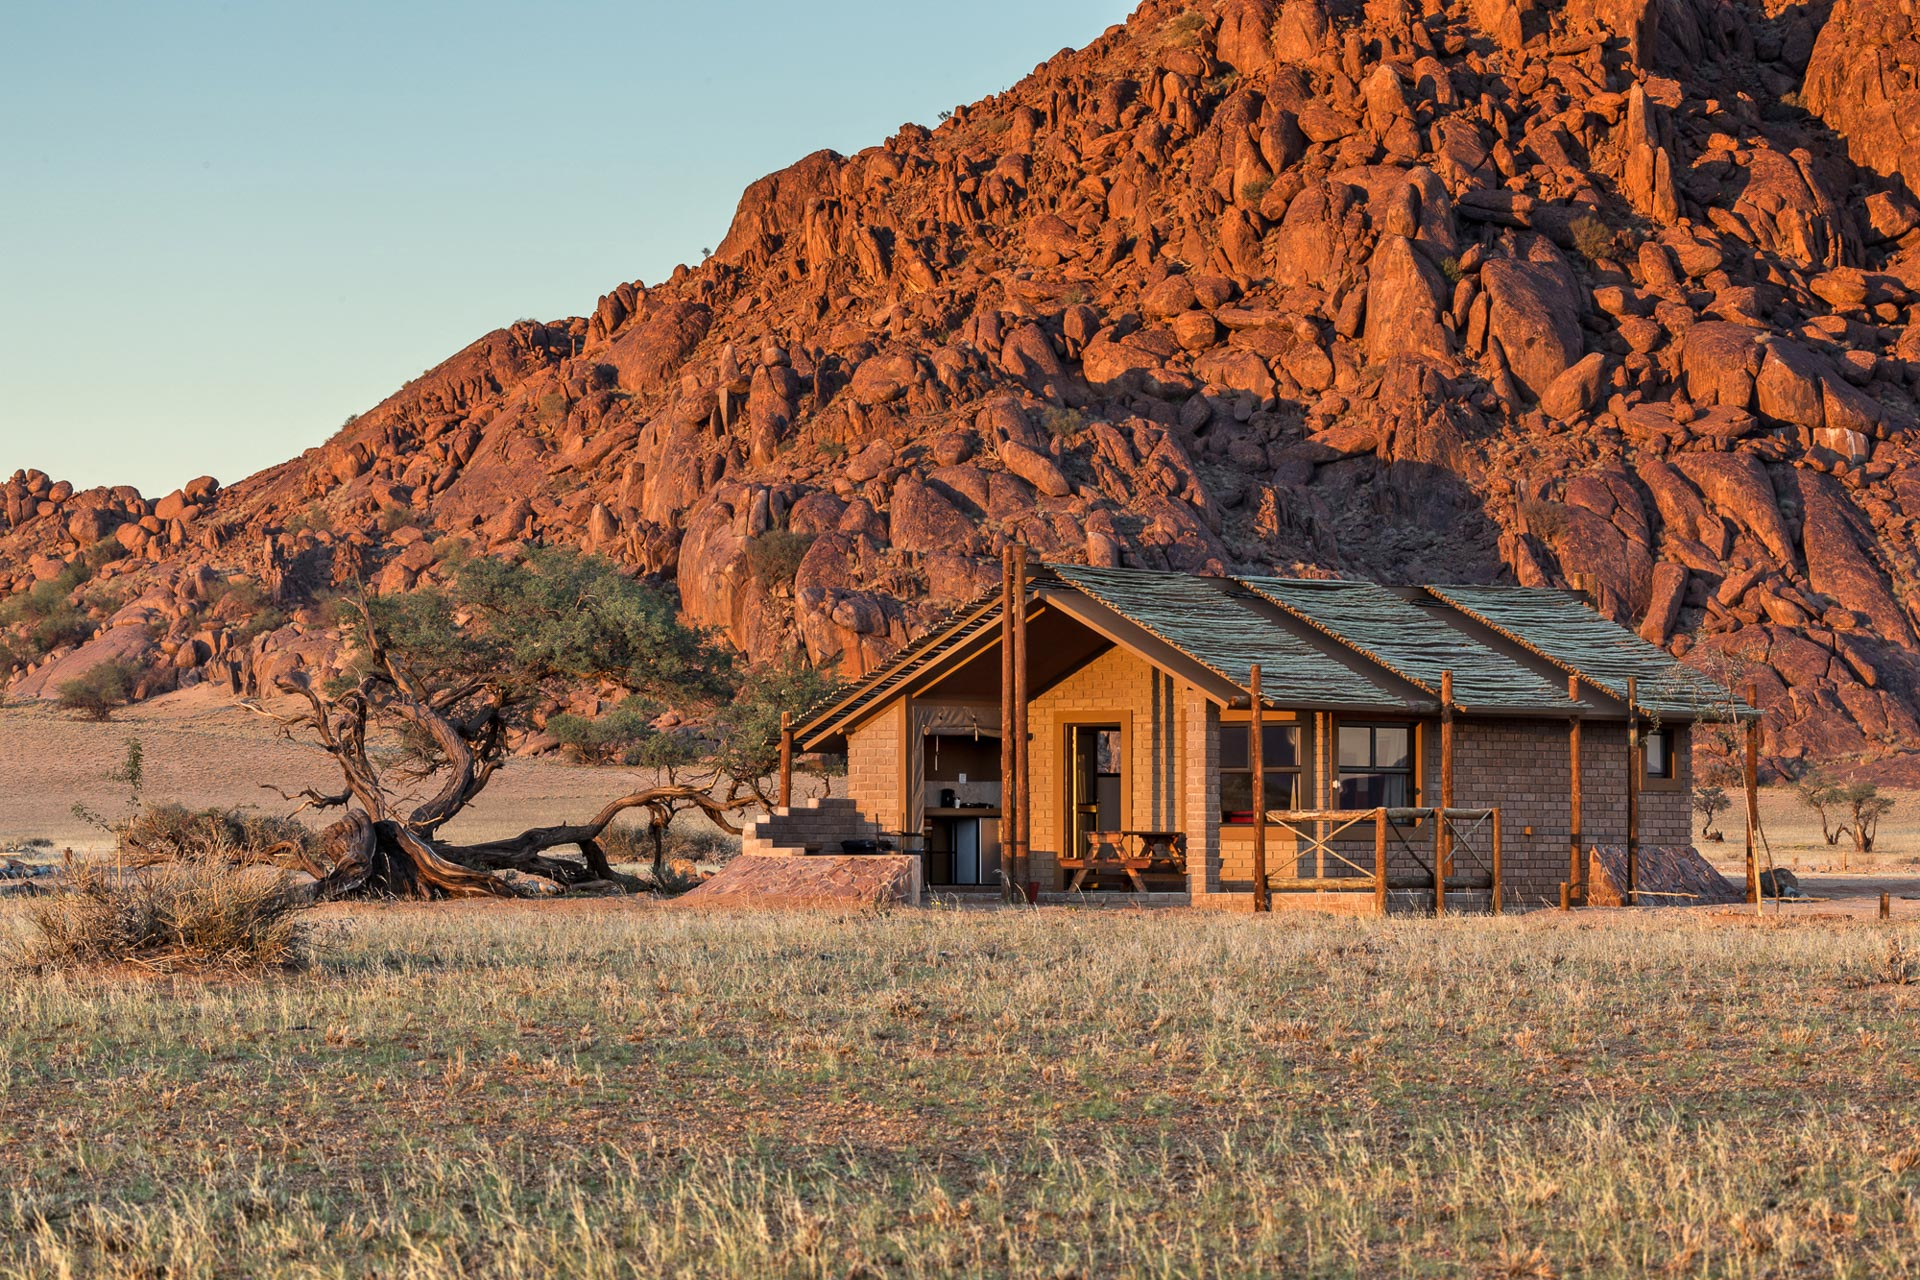 Desert-Camp-Namibia-30